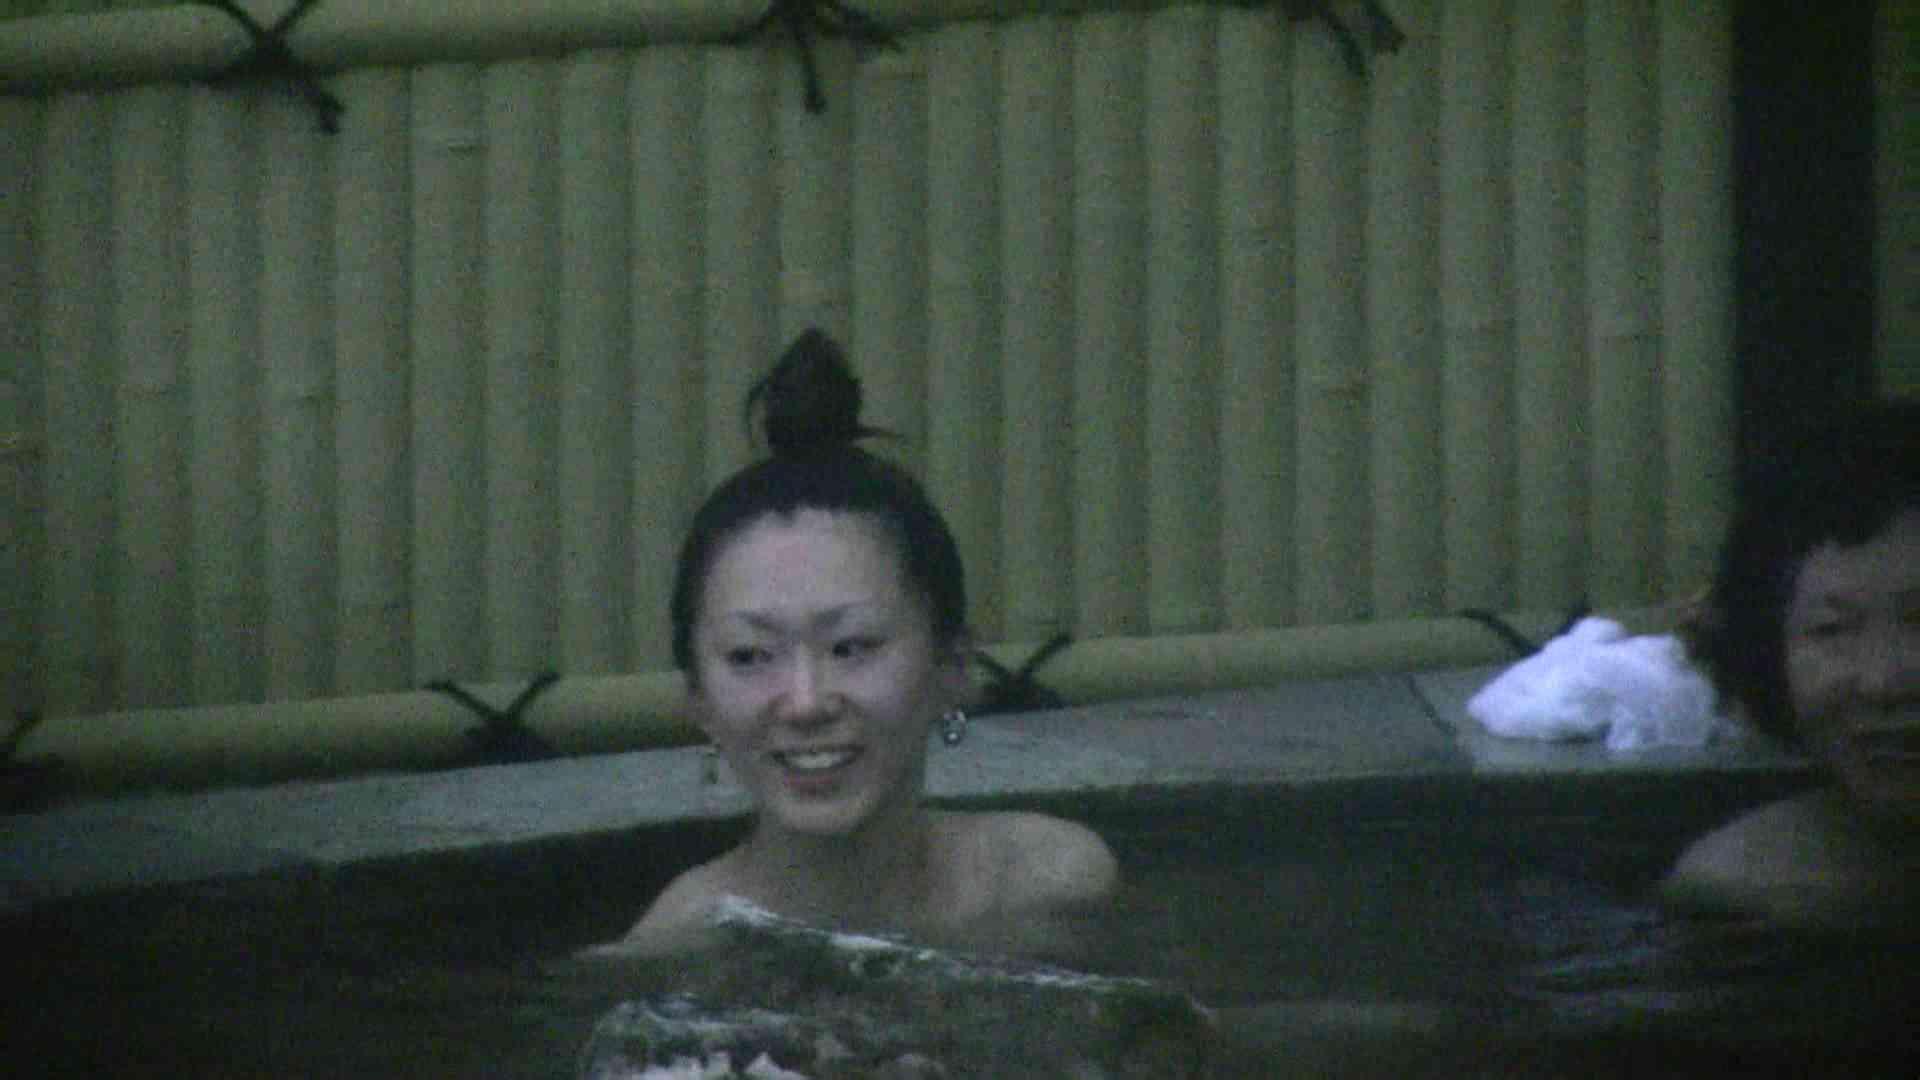 Aquaな露天風呂Vol.587 OLすけべ画像 隠し撮りオマンコ動画紹介 29連発 11